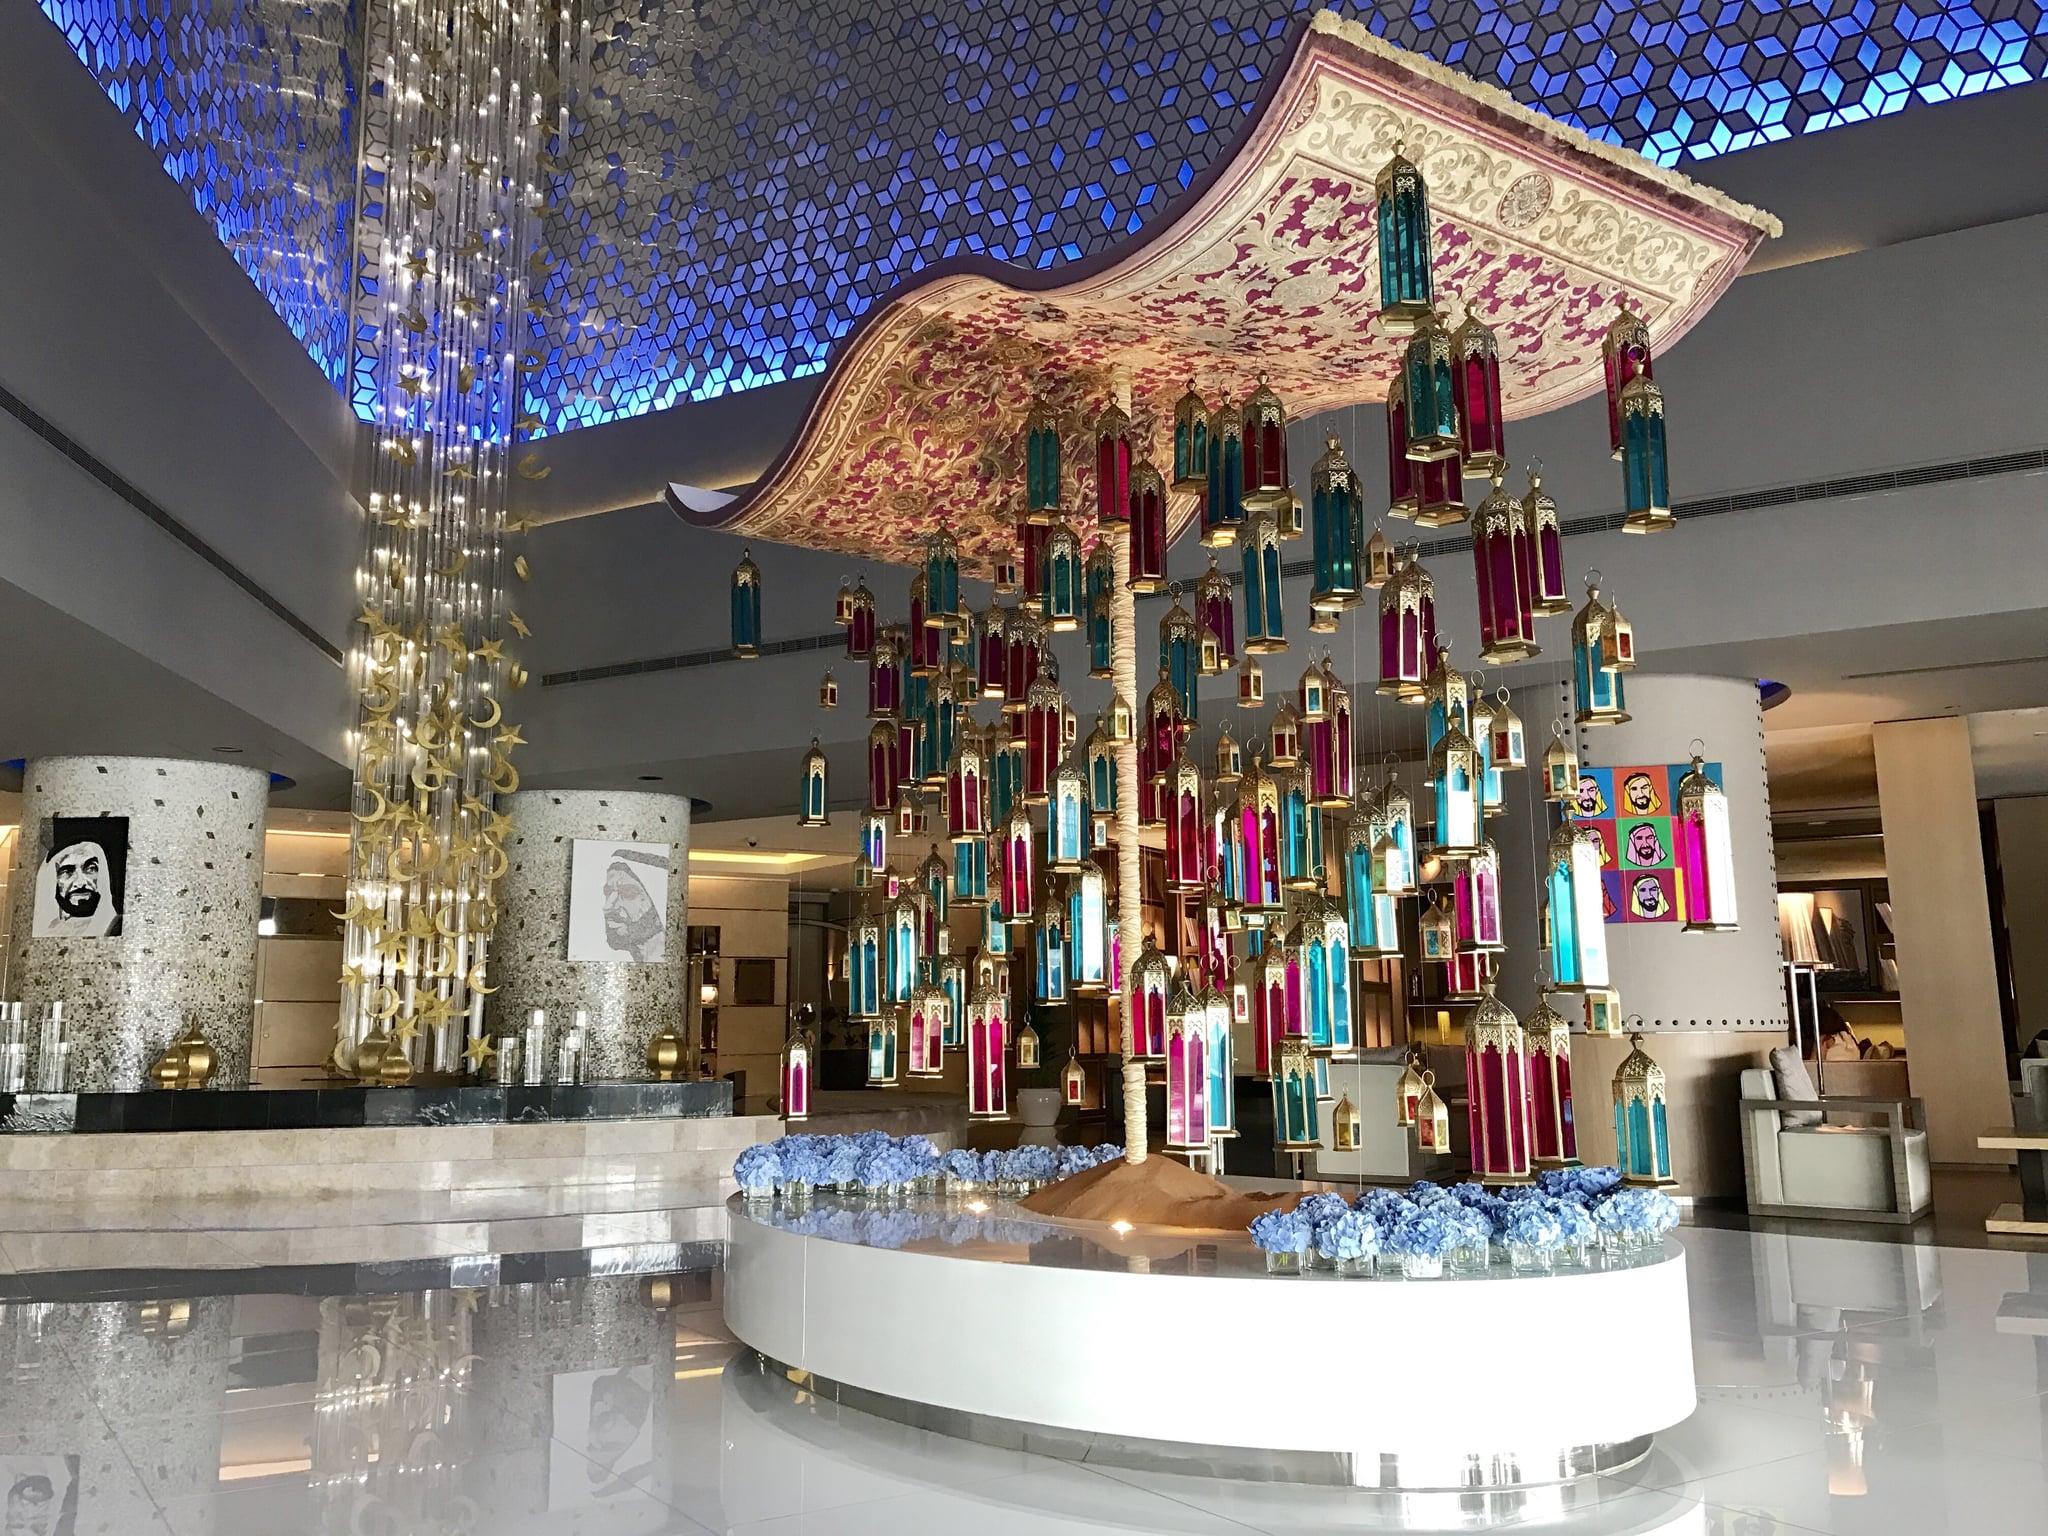 Good 1 Day Ramadan Decor - tmp_JSZnQo_8da1ab86b1cd61b8_Flying_carpet_-_Fairmont_Dubai  HD_274156.jpeg